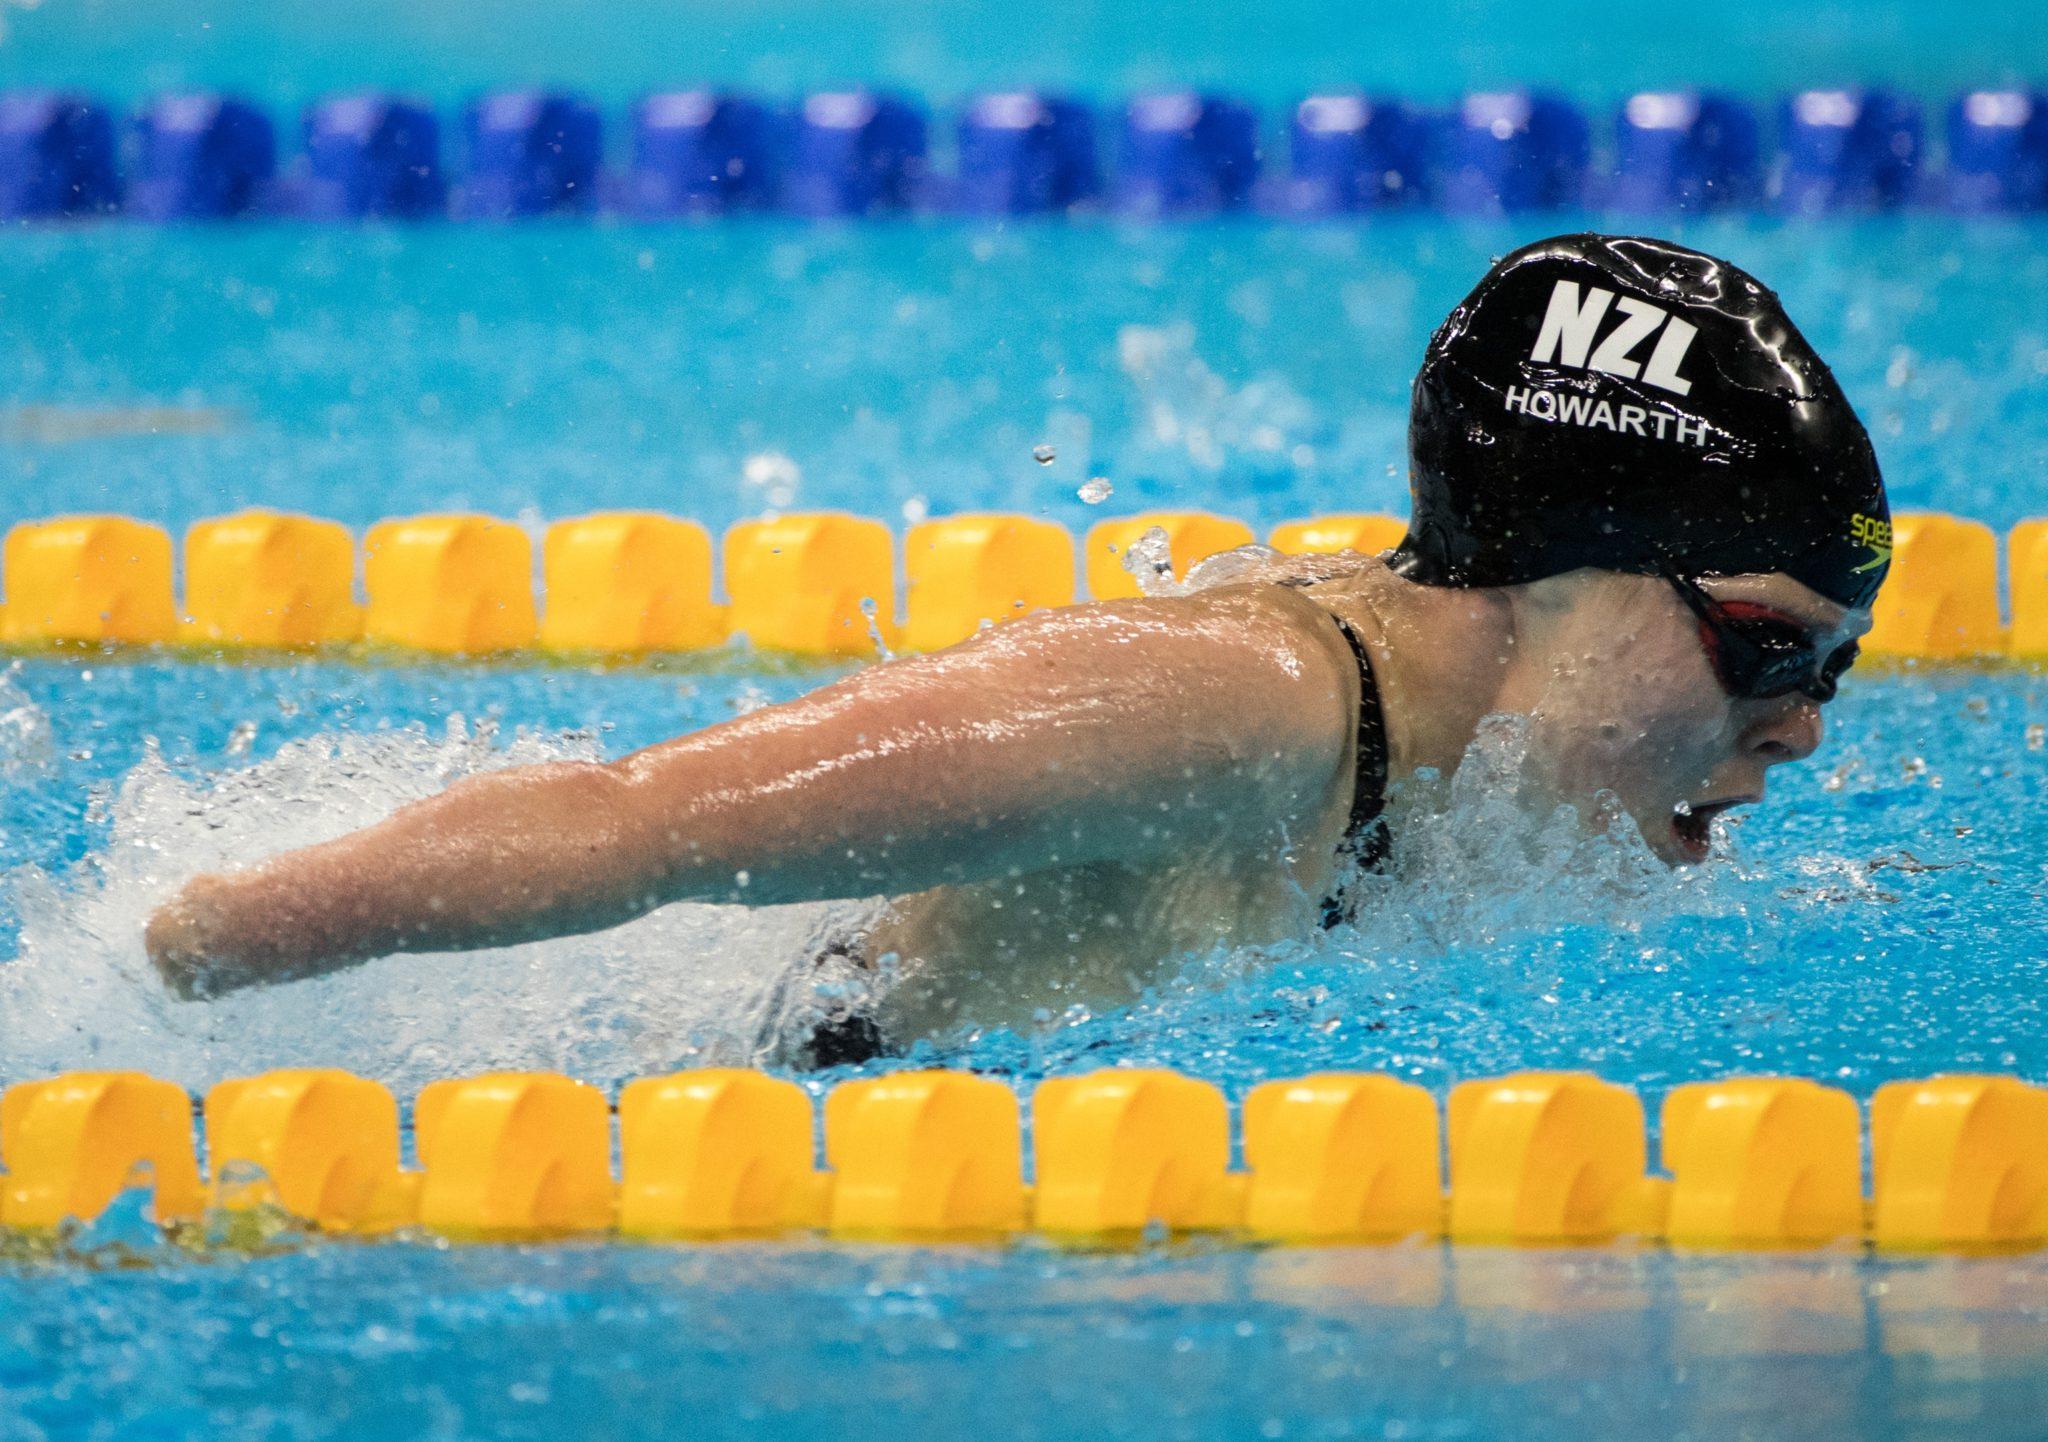 Paralympic Gold Medalist Nikita Howarth Retires at 20